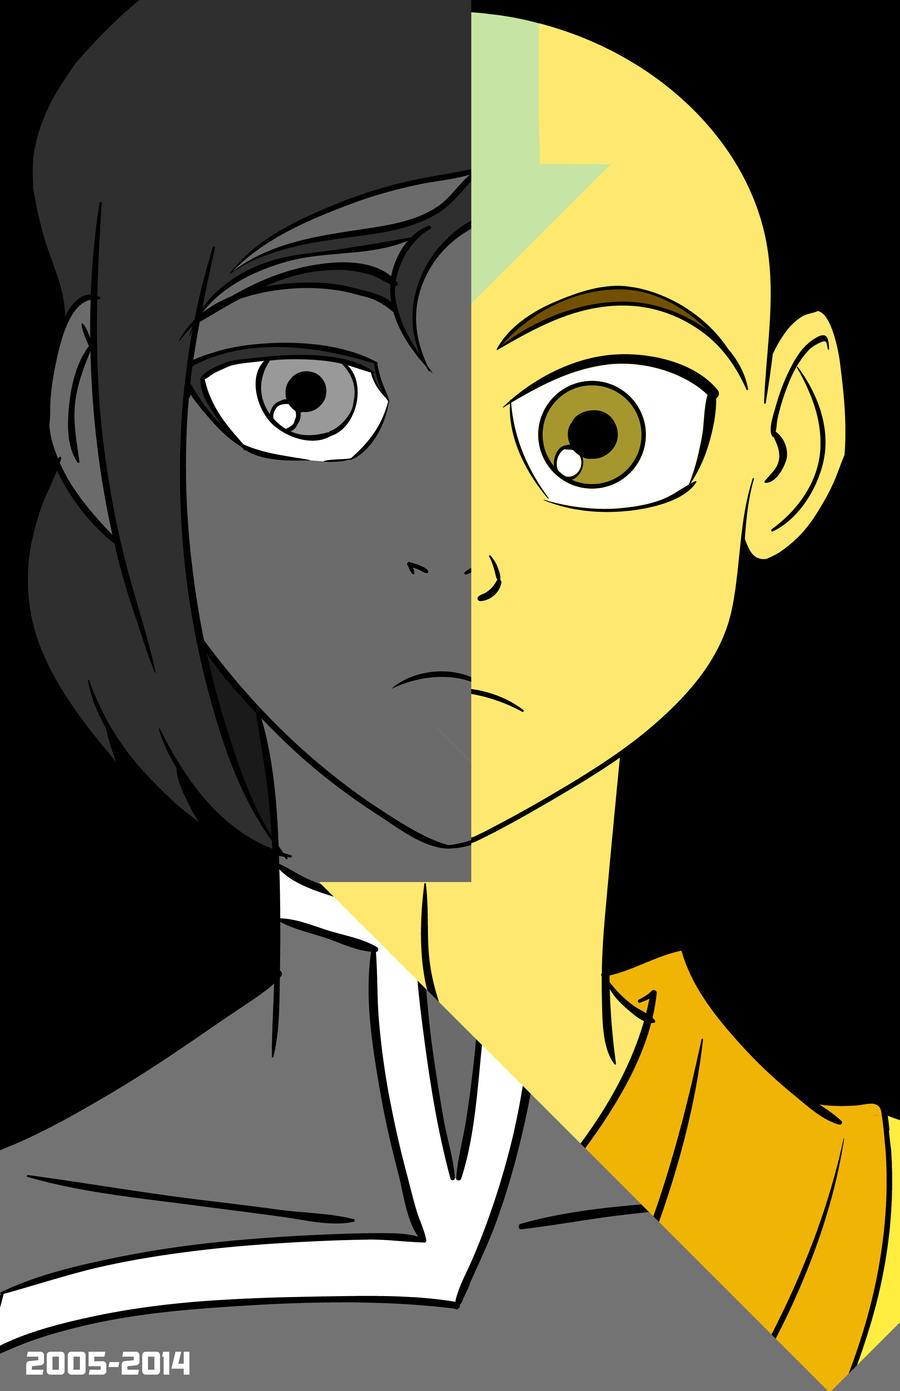 Aang Korra avatar days of future past - aang korrachbgraphics on